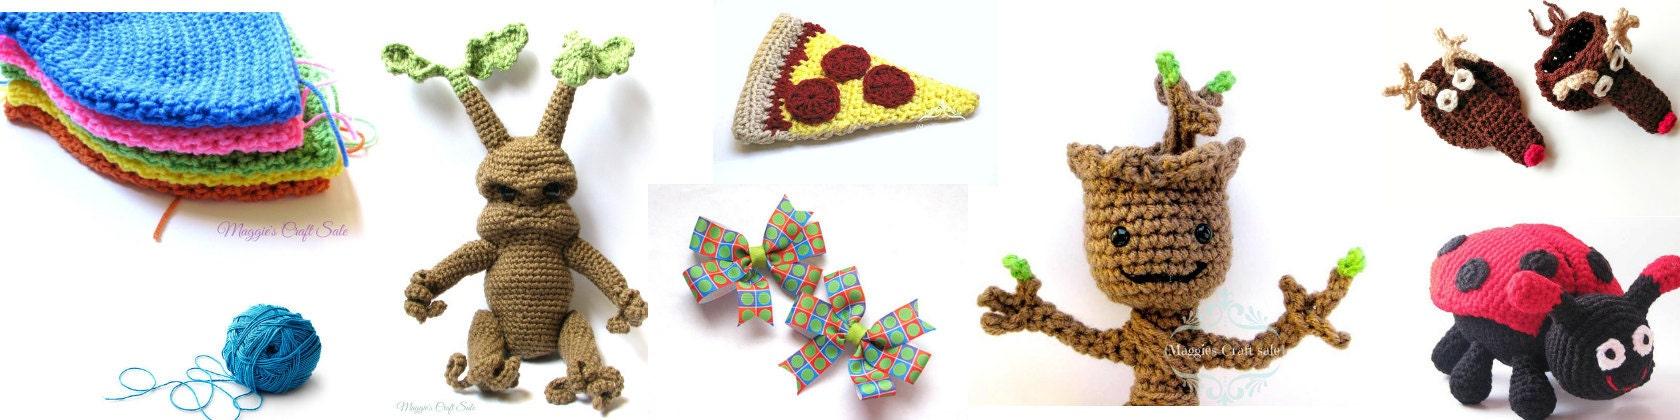 Crochet Baby Items Toys Bows Scarfs & More por MaggiesCraftSale